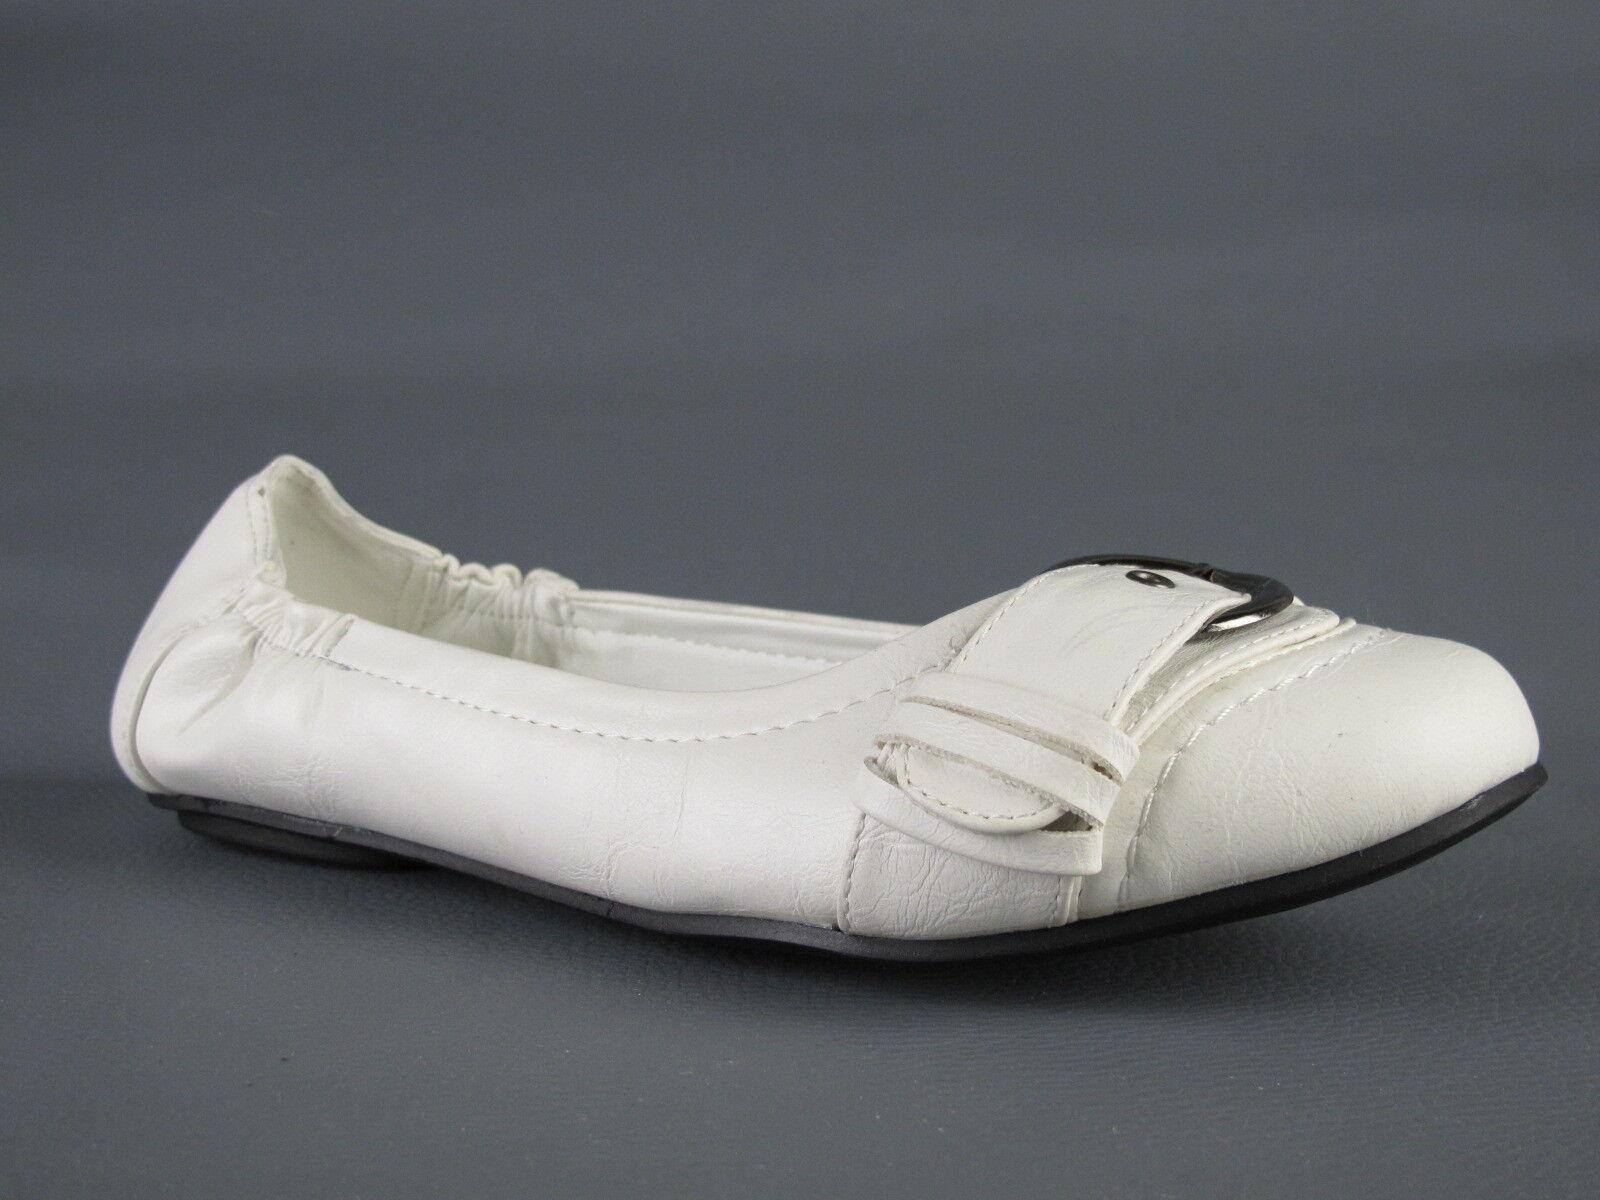 CITY WALK BALLERINA WEISS LEDERIMITAT LEDERIMITAT WEISS NEU DAMEN  Zapatos   SOMMER Zapatos  NEU 8e9e0a